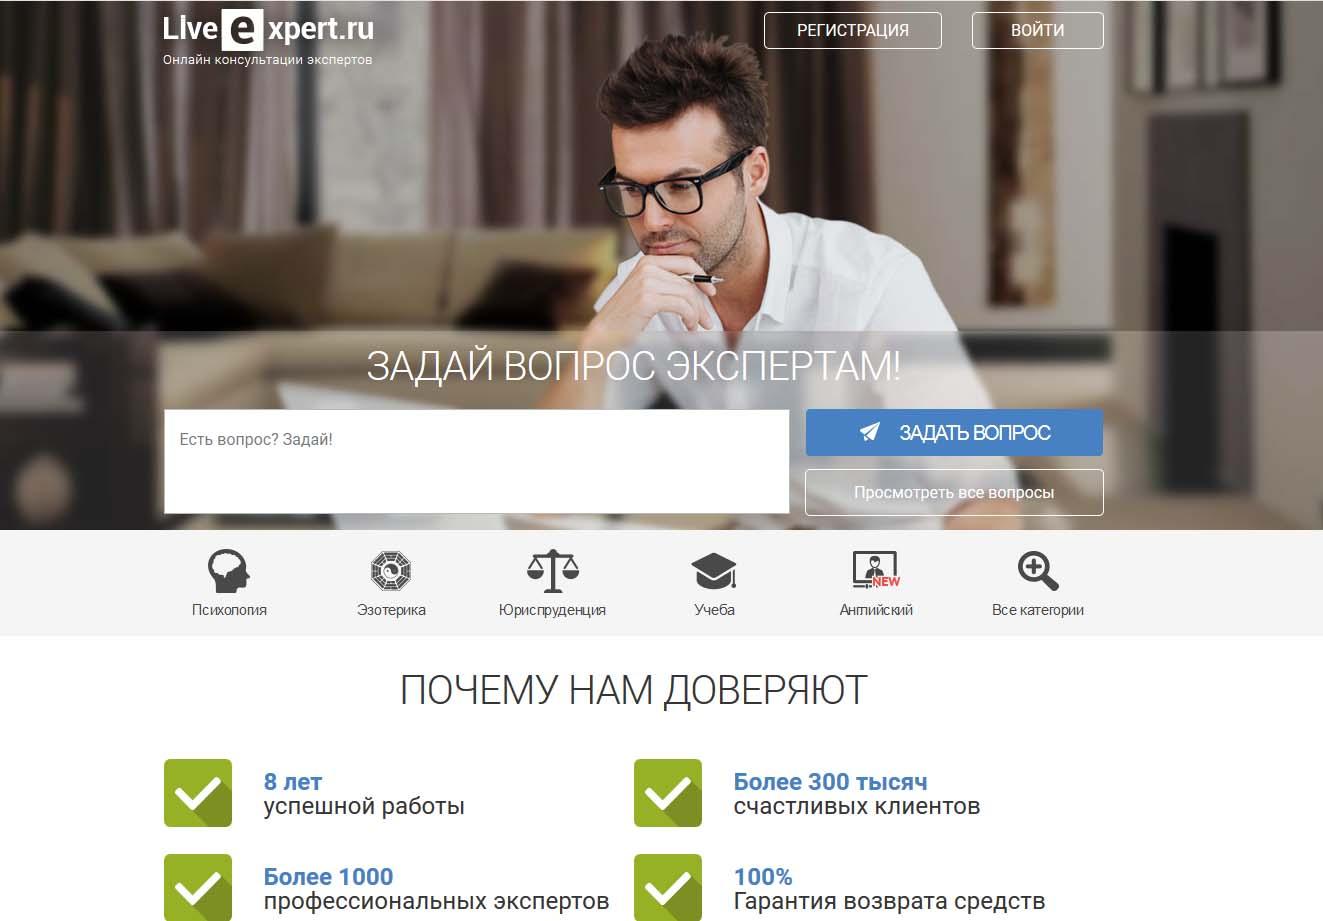 liveexpert сервис для заработка на консультациях